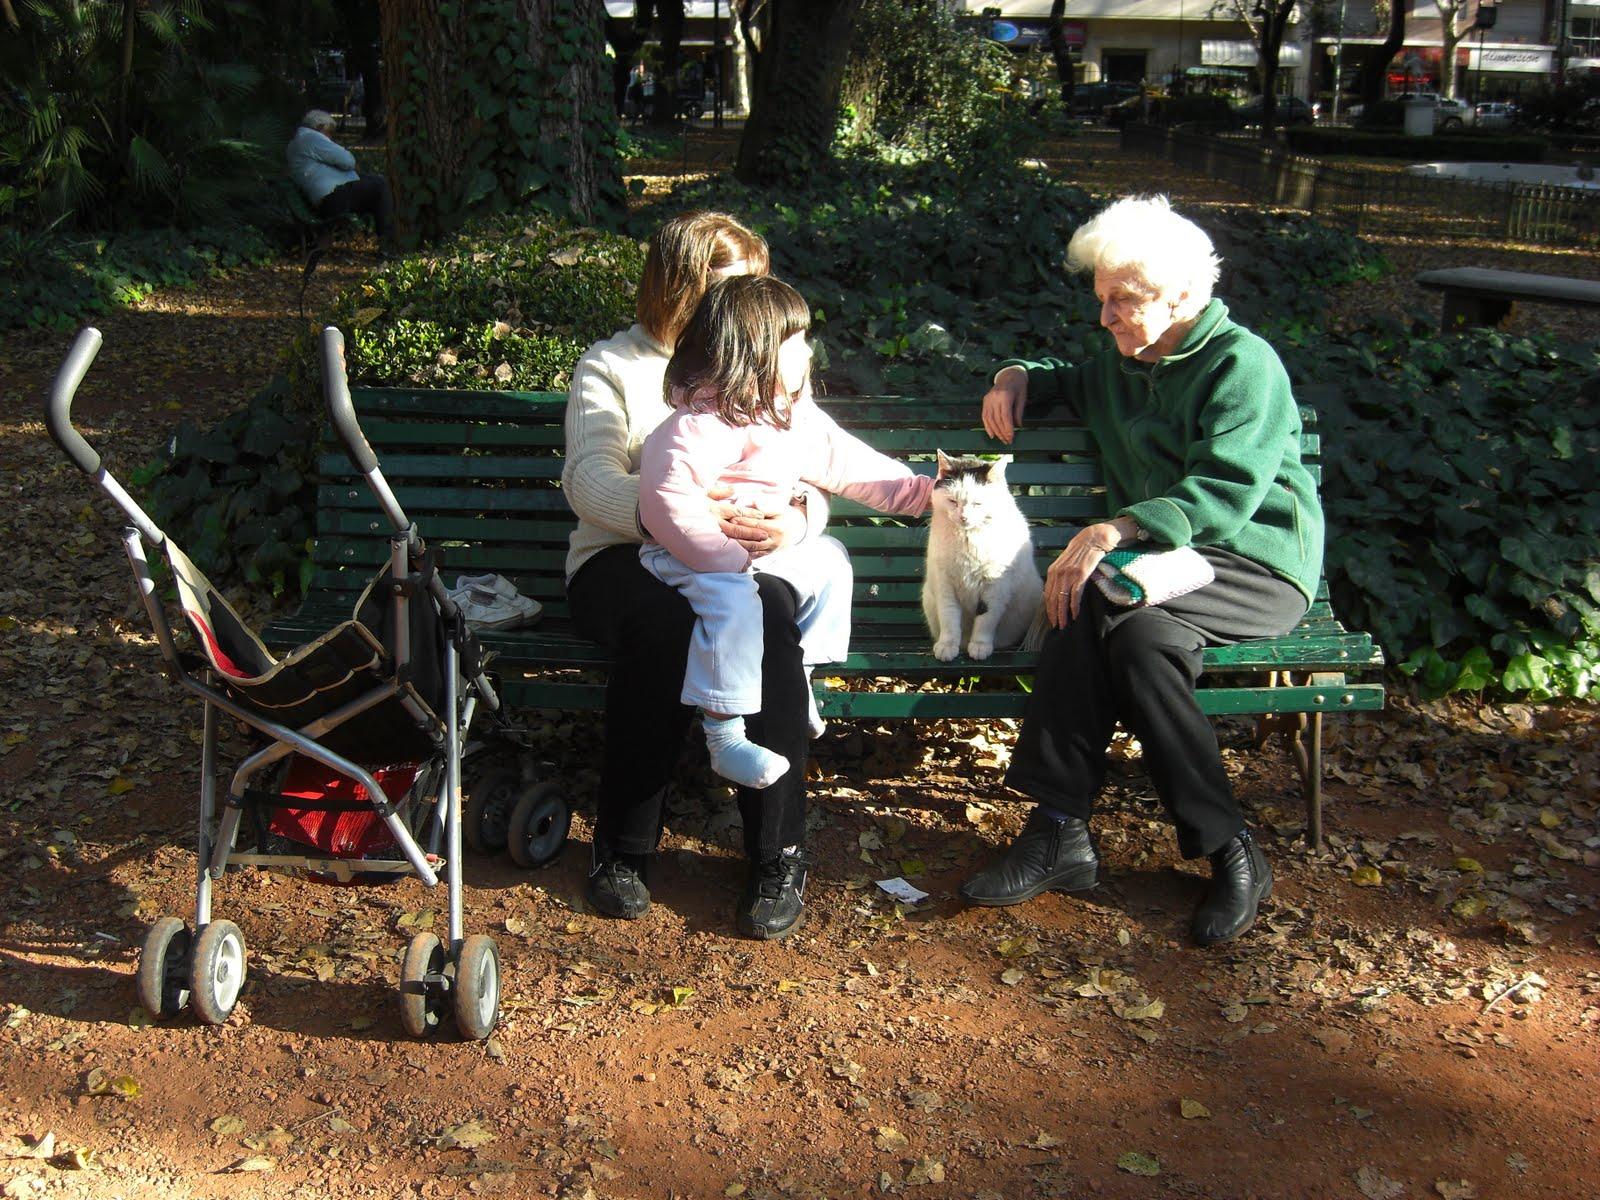 cico: 猫の集う植物園